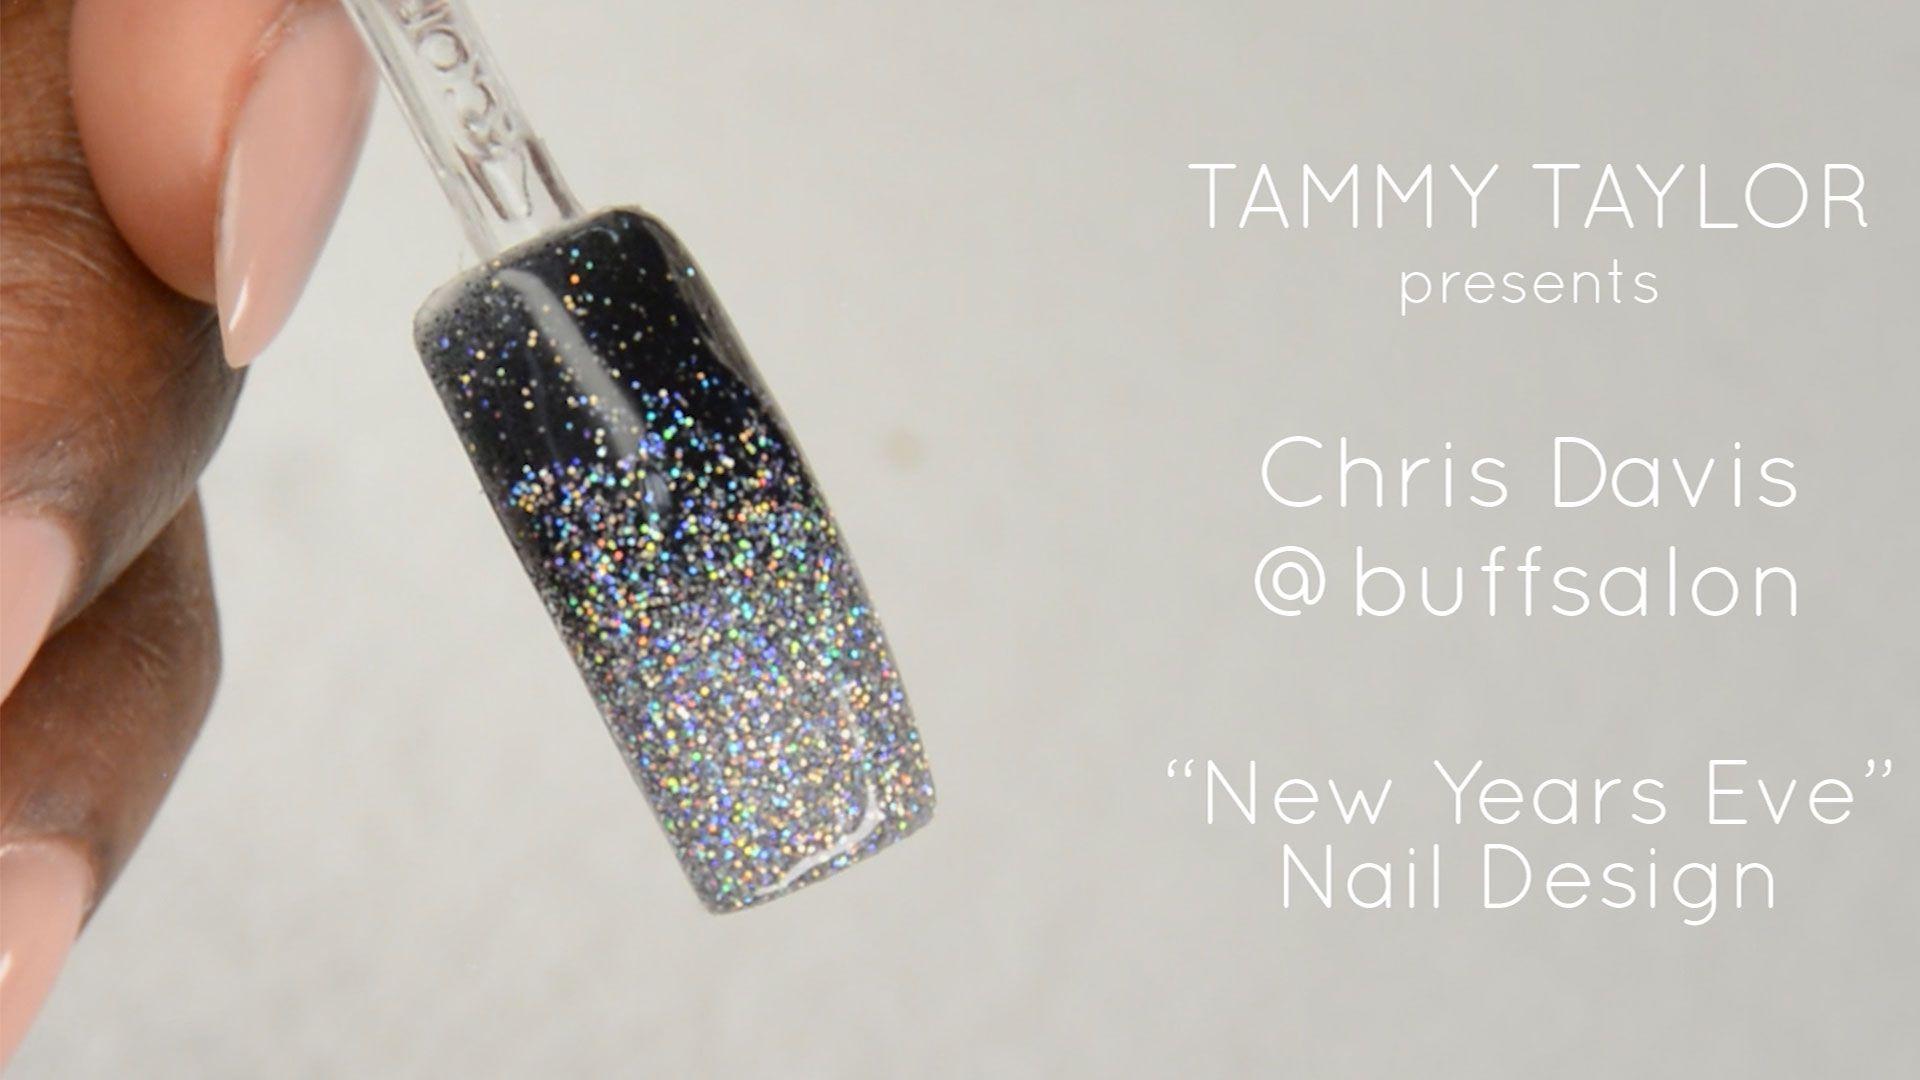 New Years Eve Nail Design By Chris Davis Buffsalon Videos